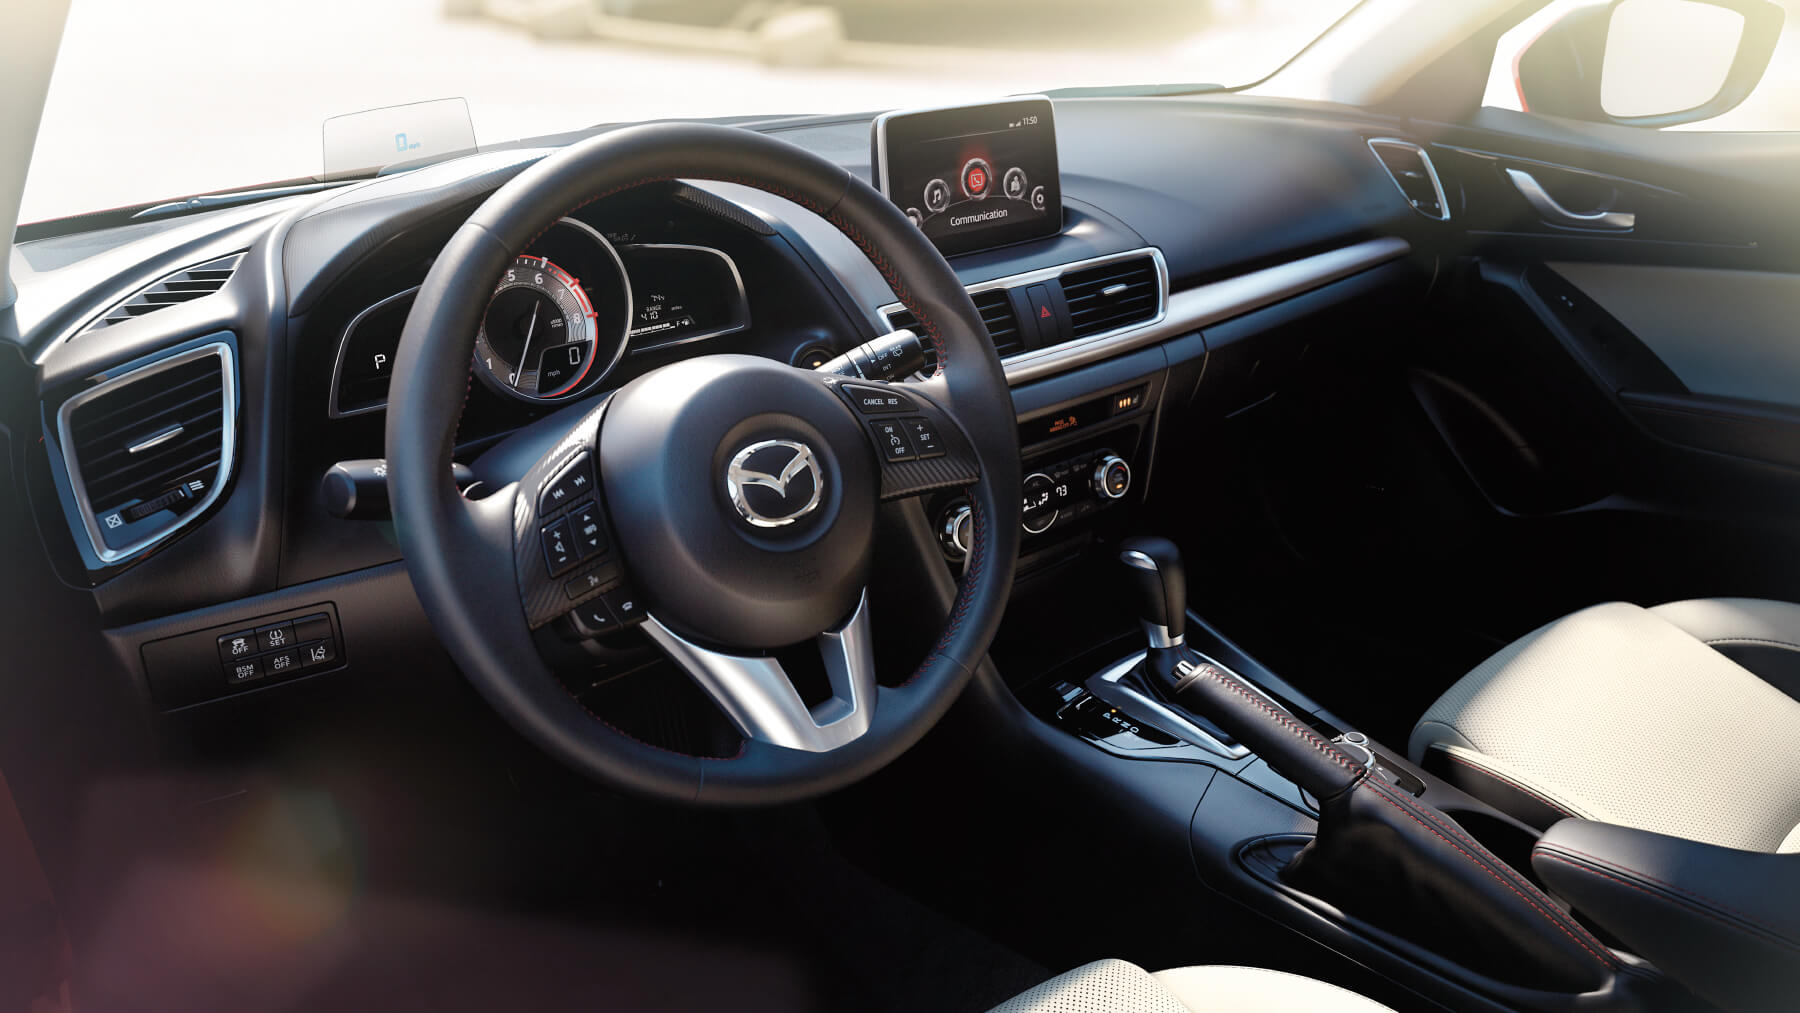 2016 Mazda 3 Sedan Fuel Efficient Compact Car Mazda Usa